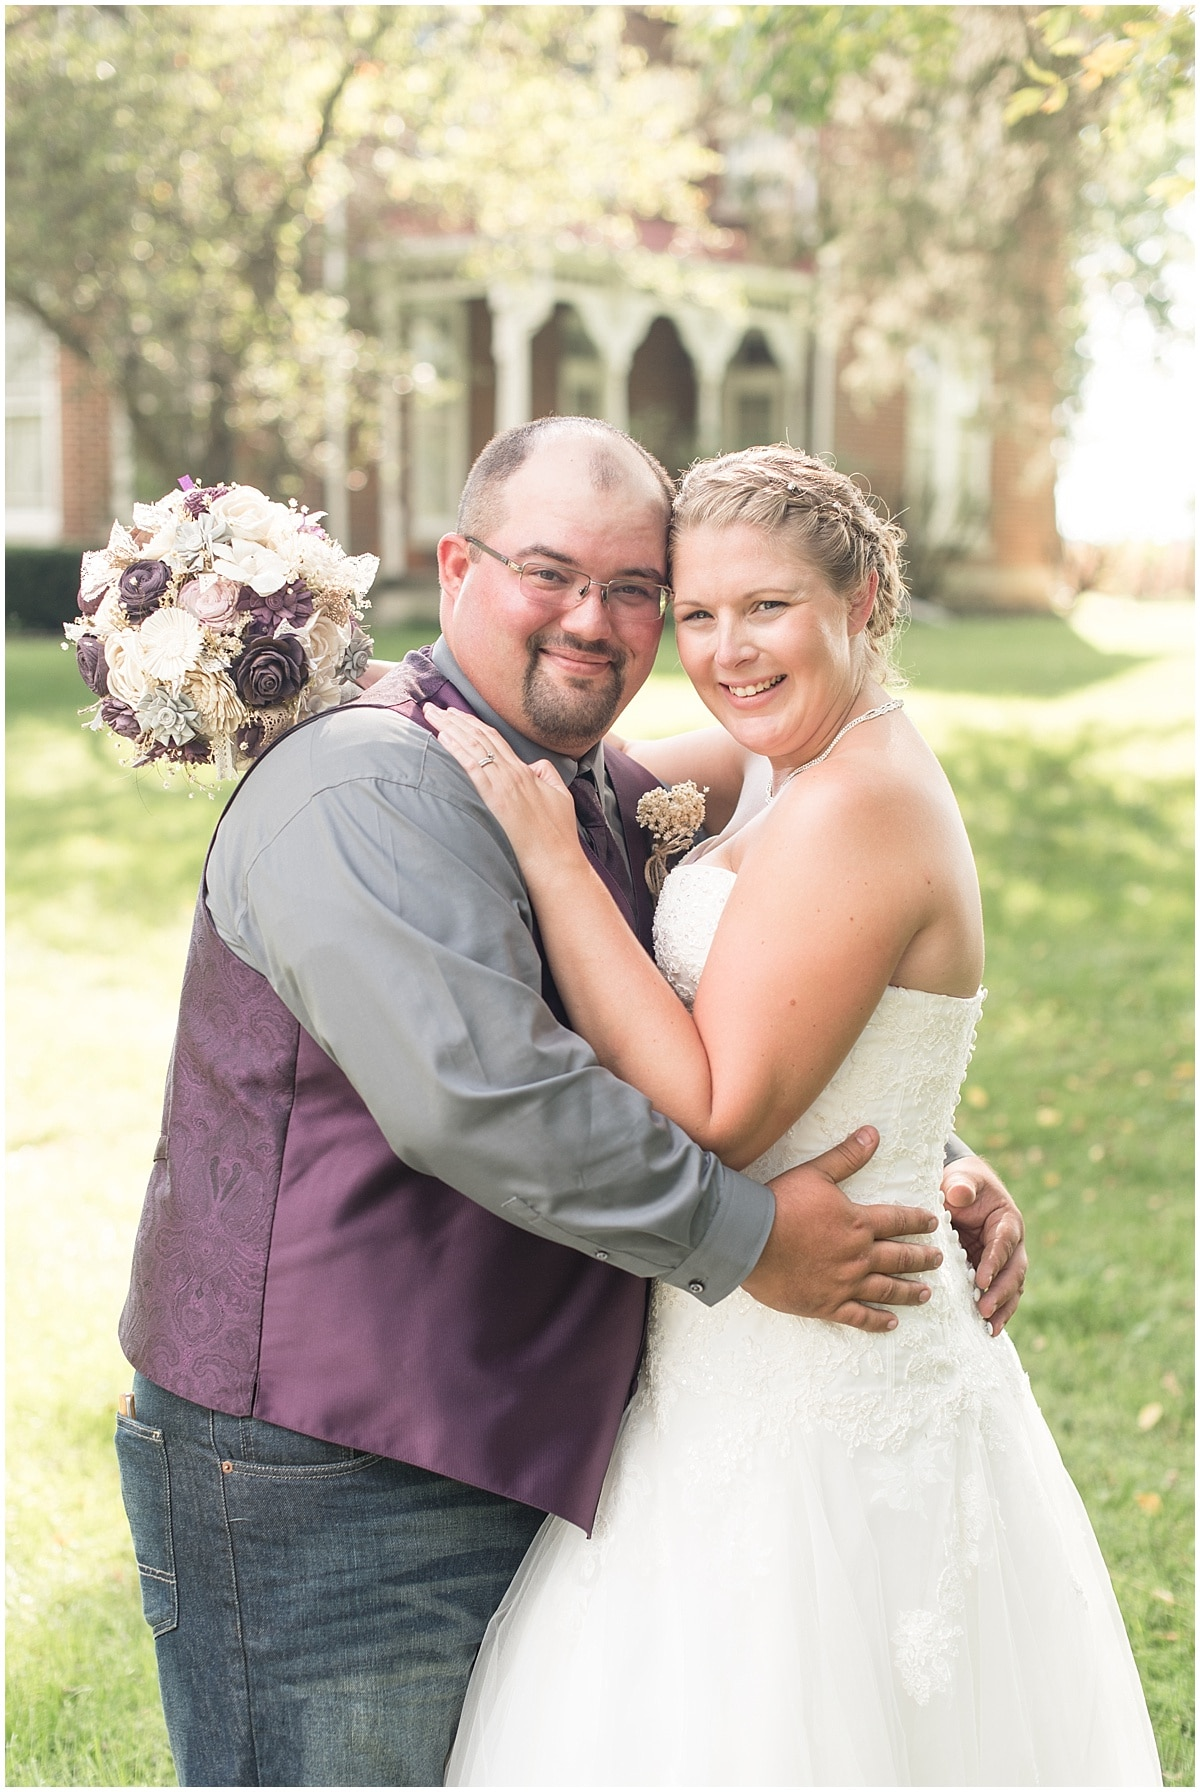 Wedding at Legacy Barn in Kokomo, Indiana 36.jpg